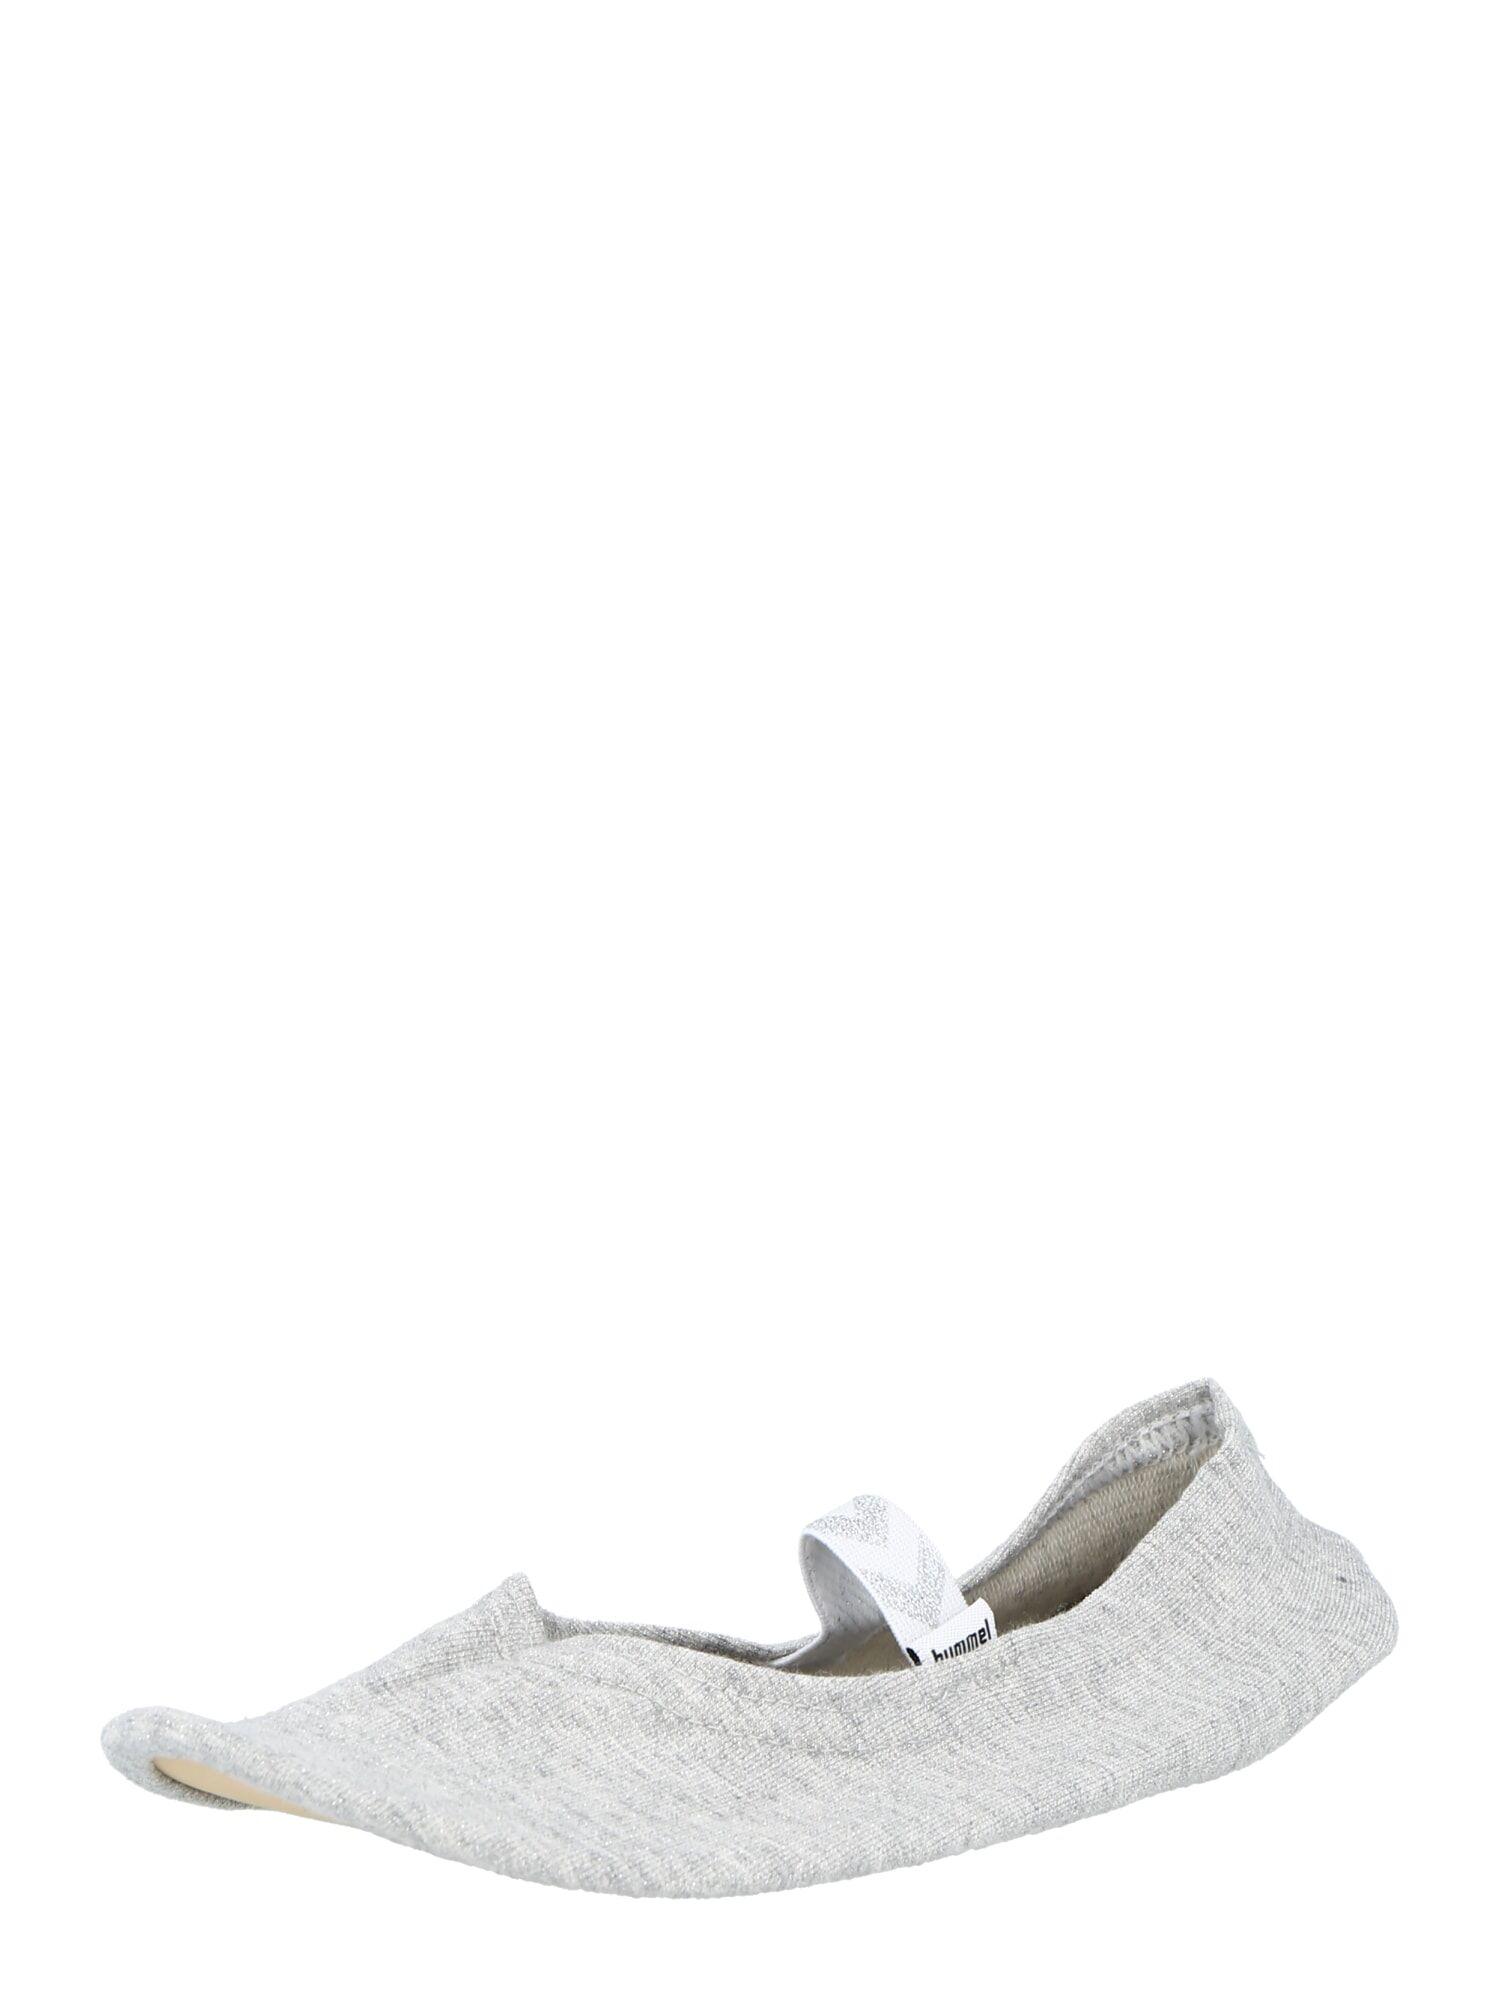 Hummel Chaussure de sport  - Gris - Taille: 30 - boy